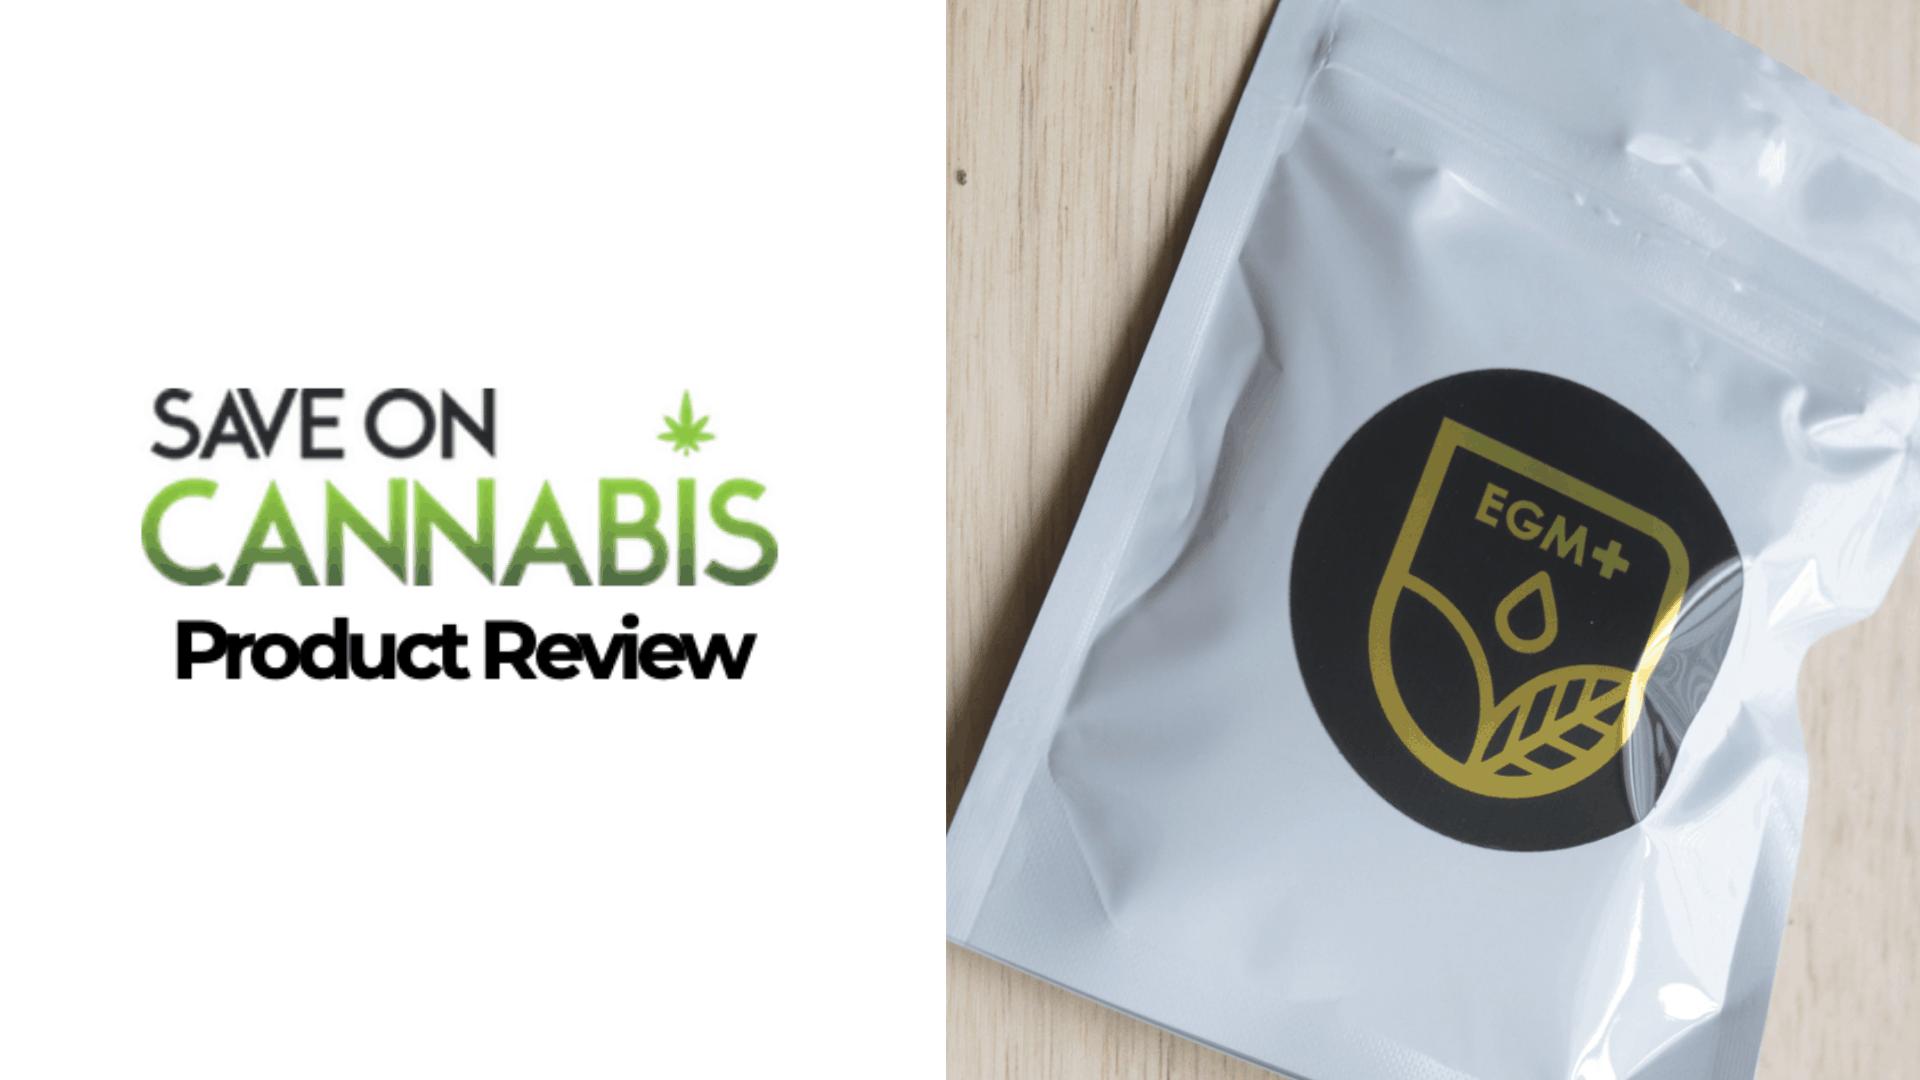 Evergreen Medicinal Review - Save On Cannabis Mail Order Marijuana Canada